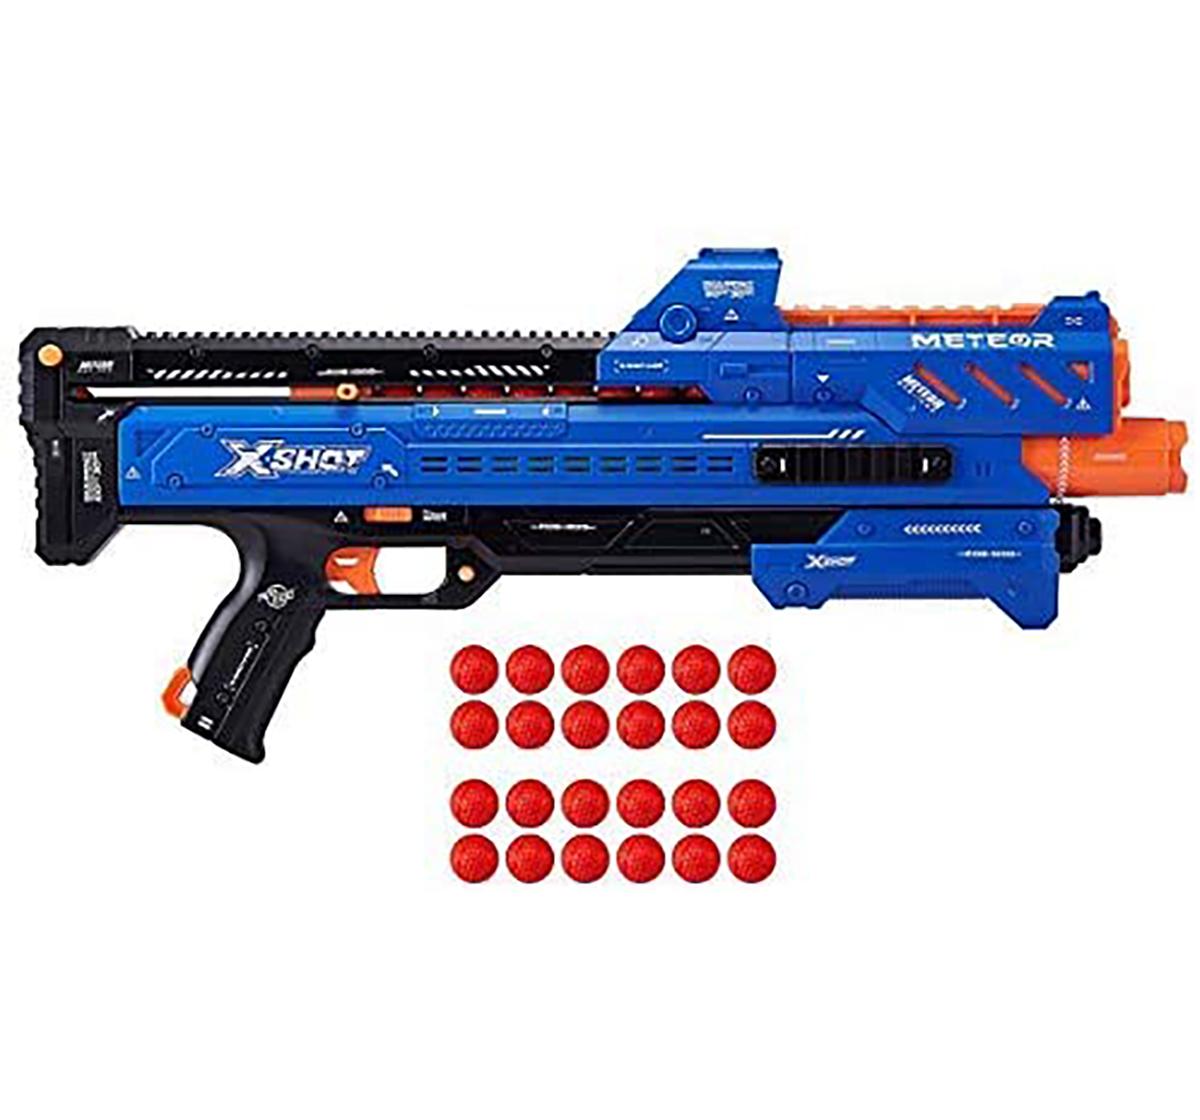 X-Shot | X-Shot Chaos Orbit Blaster with 24 Dart Ball Blasters for Kids age 14Y+